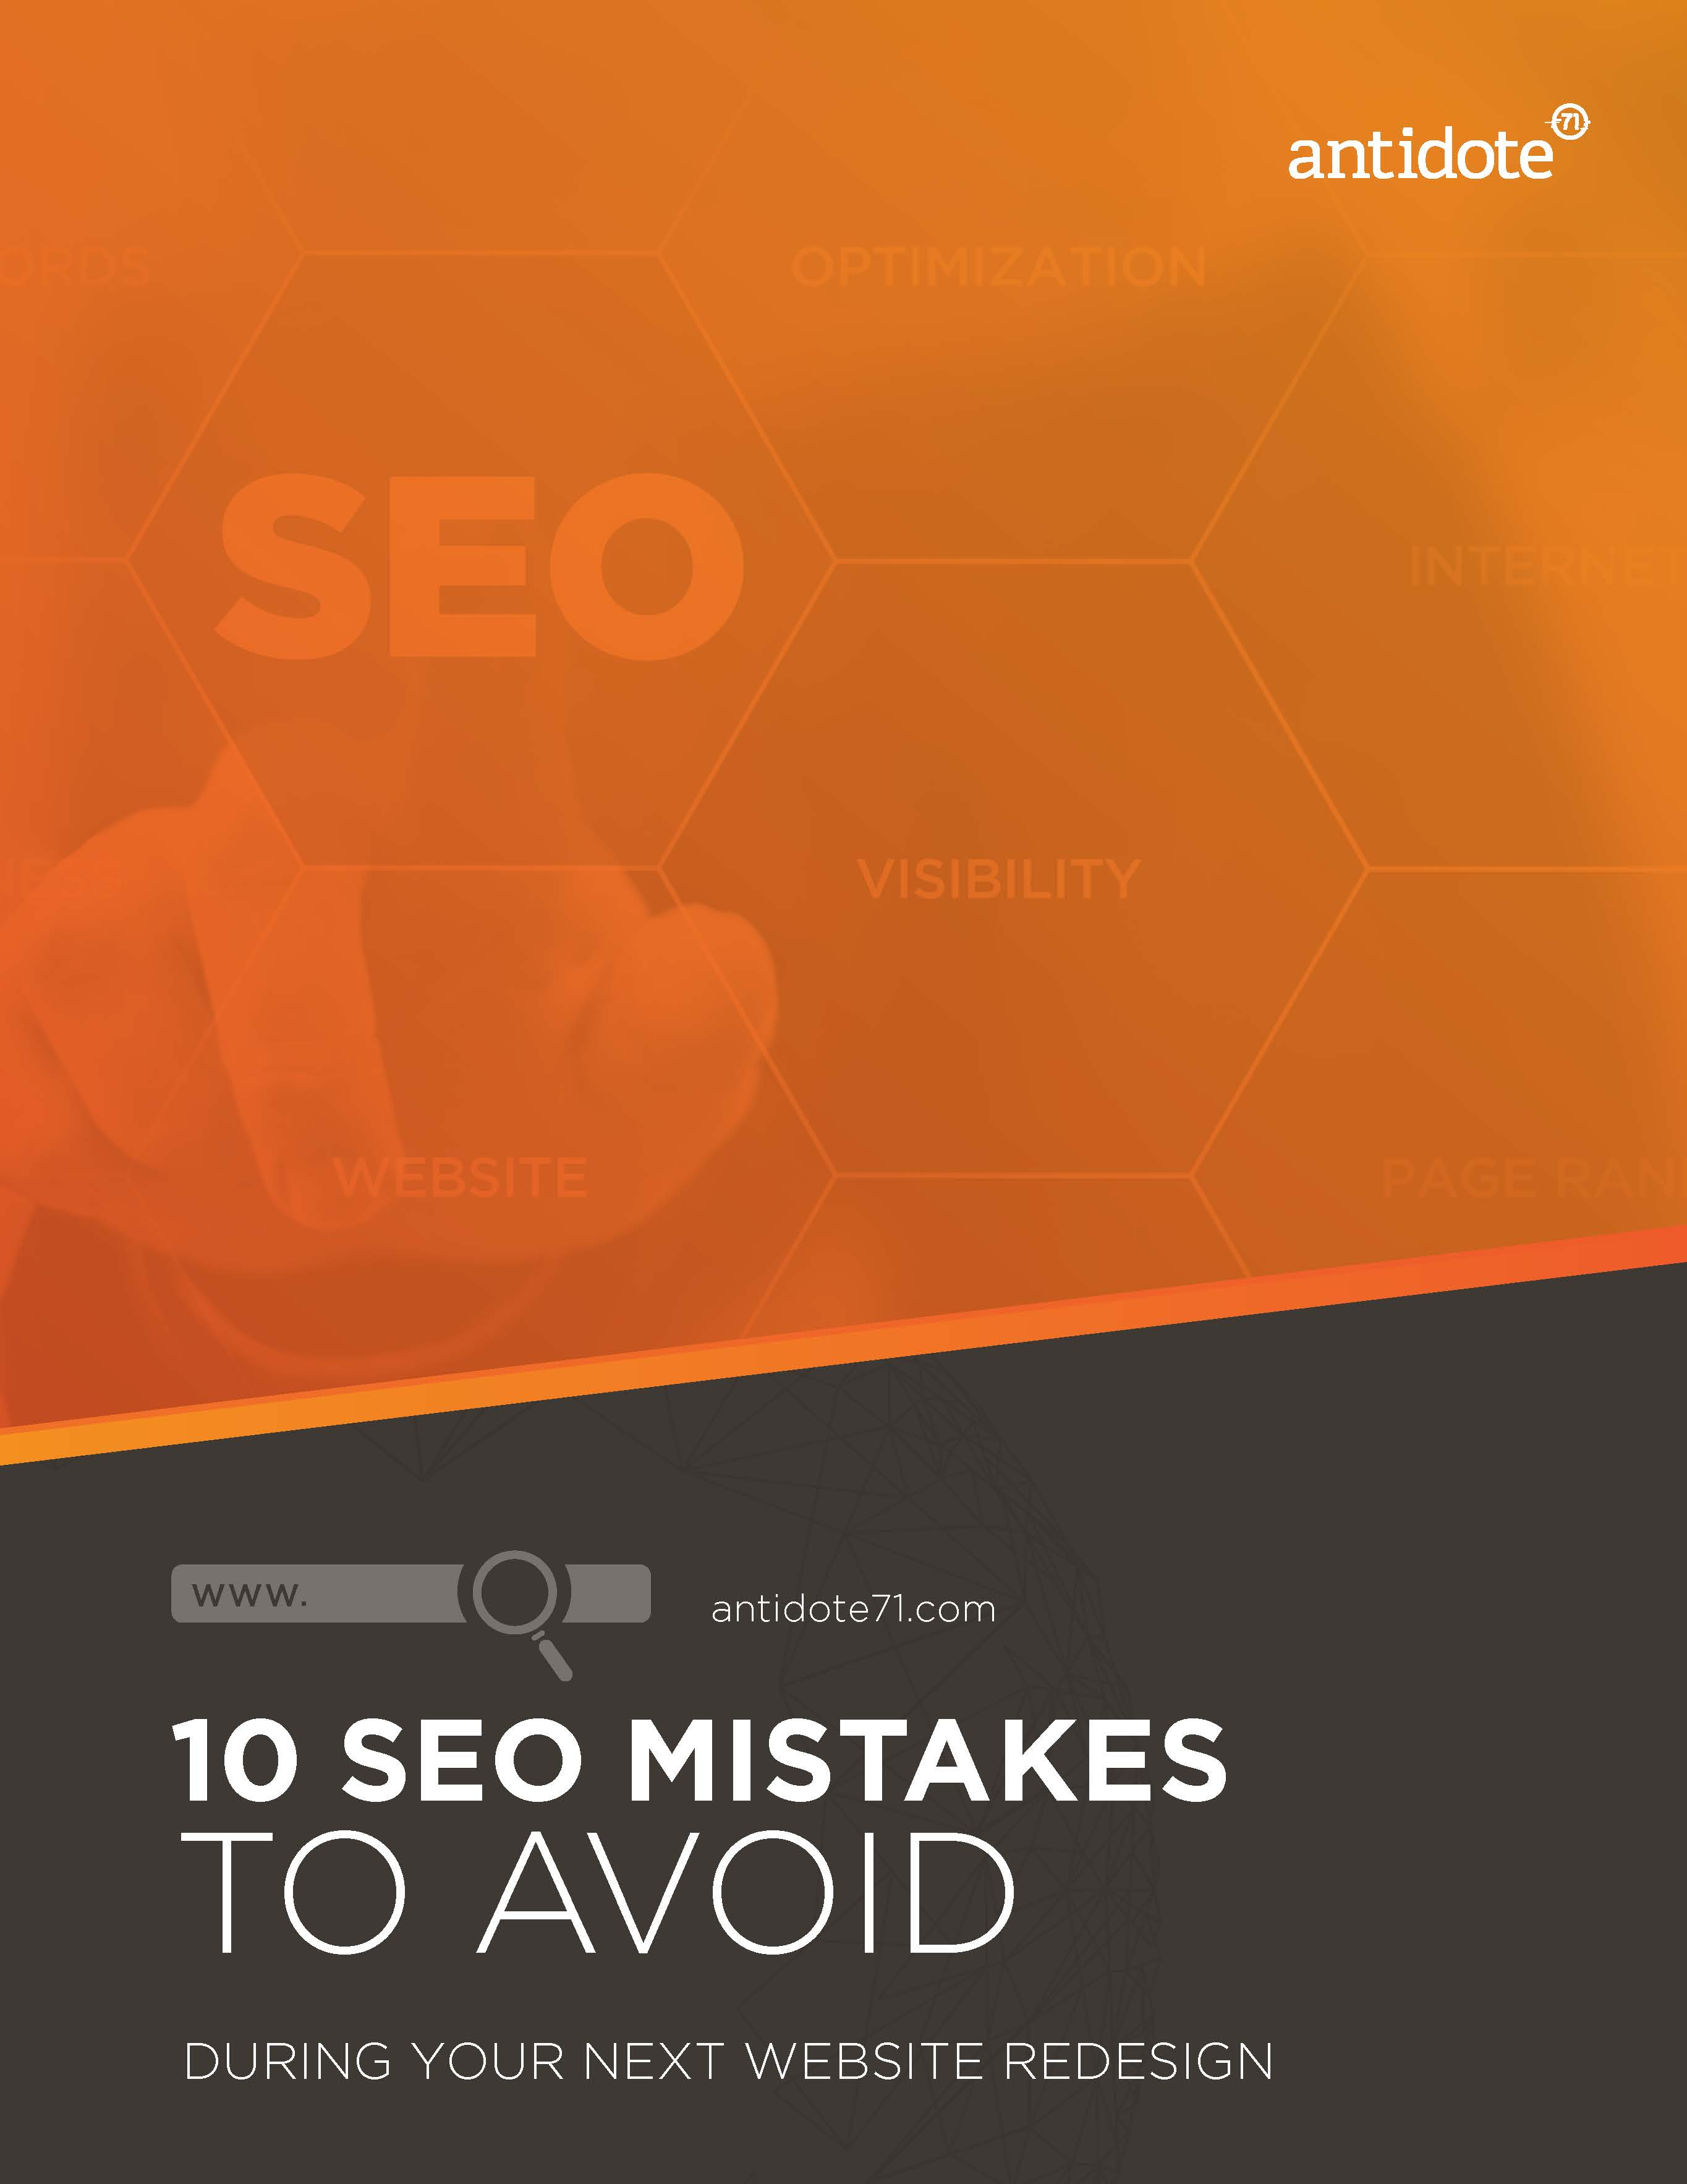 10-SEO-Mistakes-To-Avoid-Cover.jpg